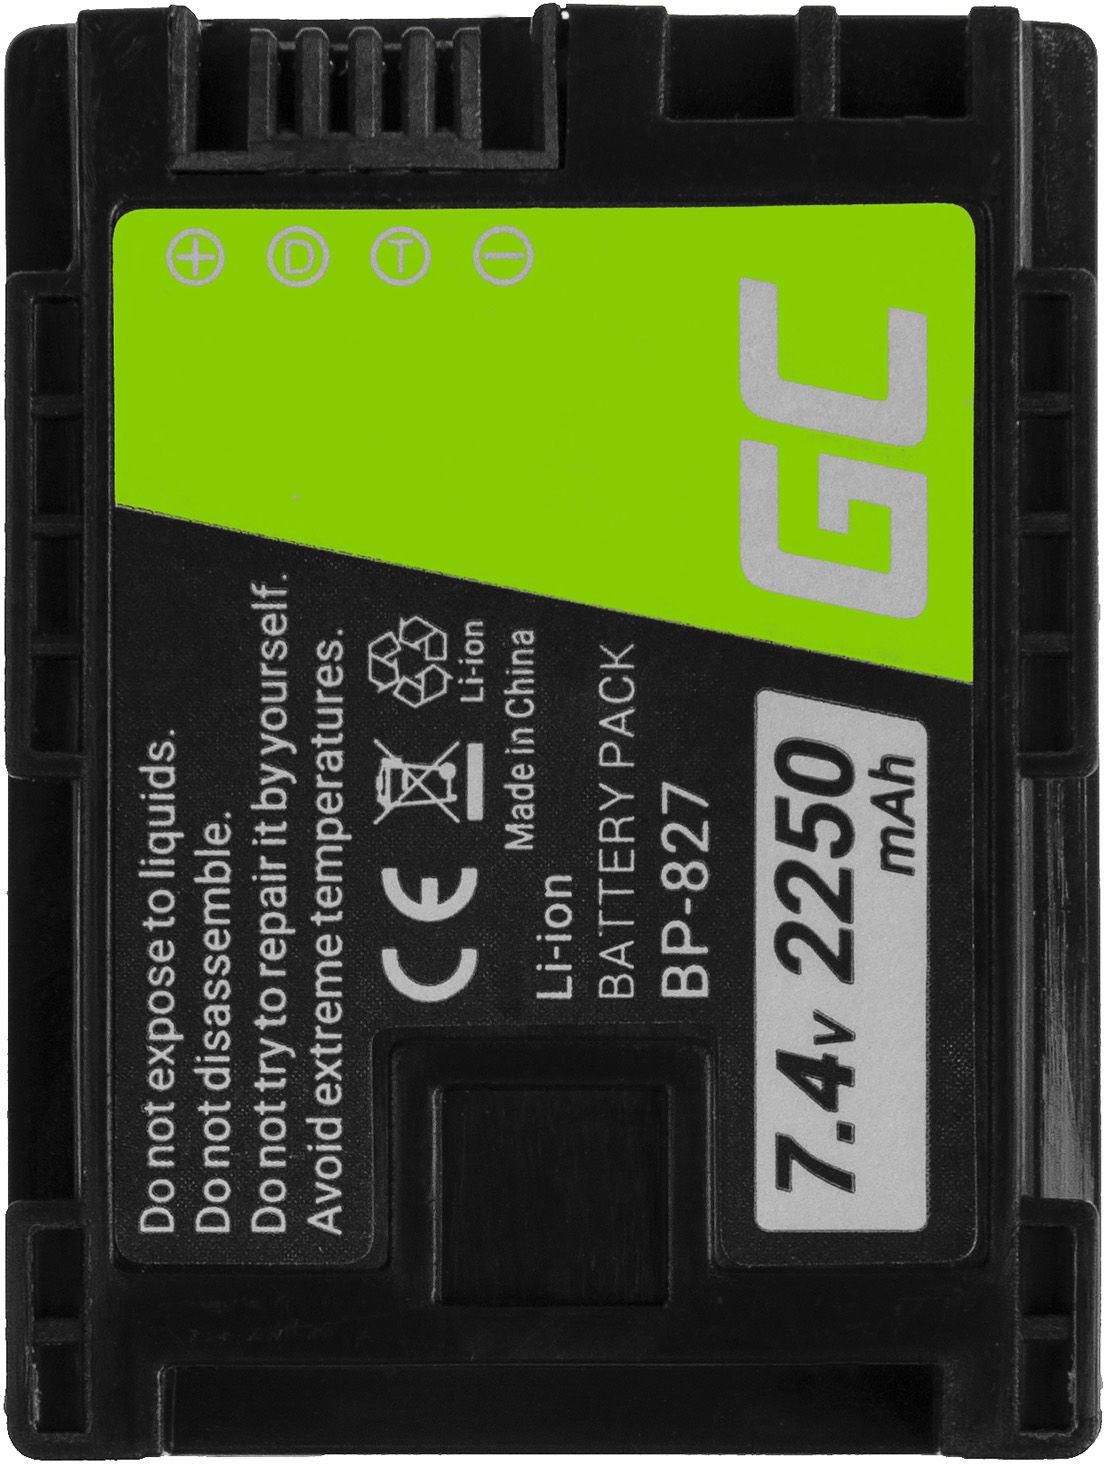 Akumulator Bateria Green Cell  BP-808 BP-809 BP-827 do Canon HF G10 S10 S21 S30 S100 S200 FS11 HF11 HF20 LEGRIA 7.4V 2250mAh